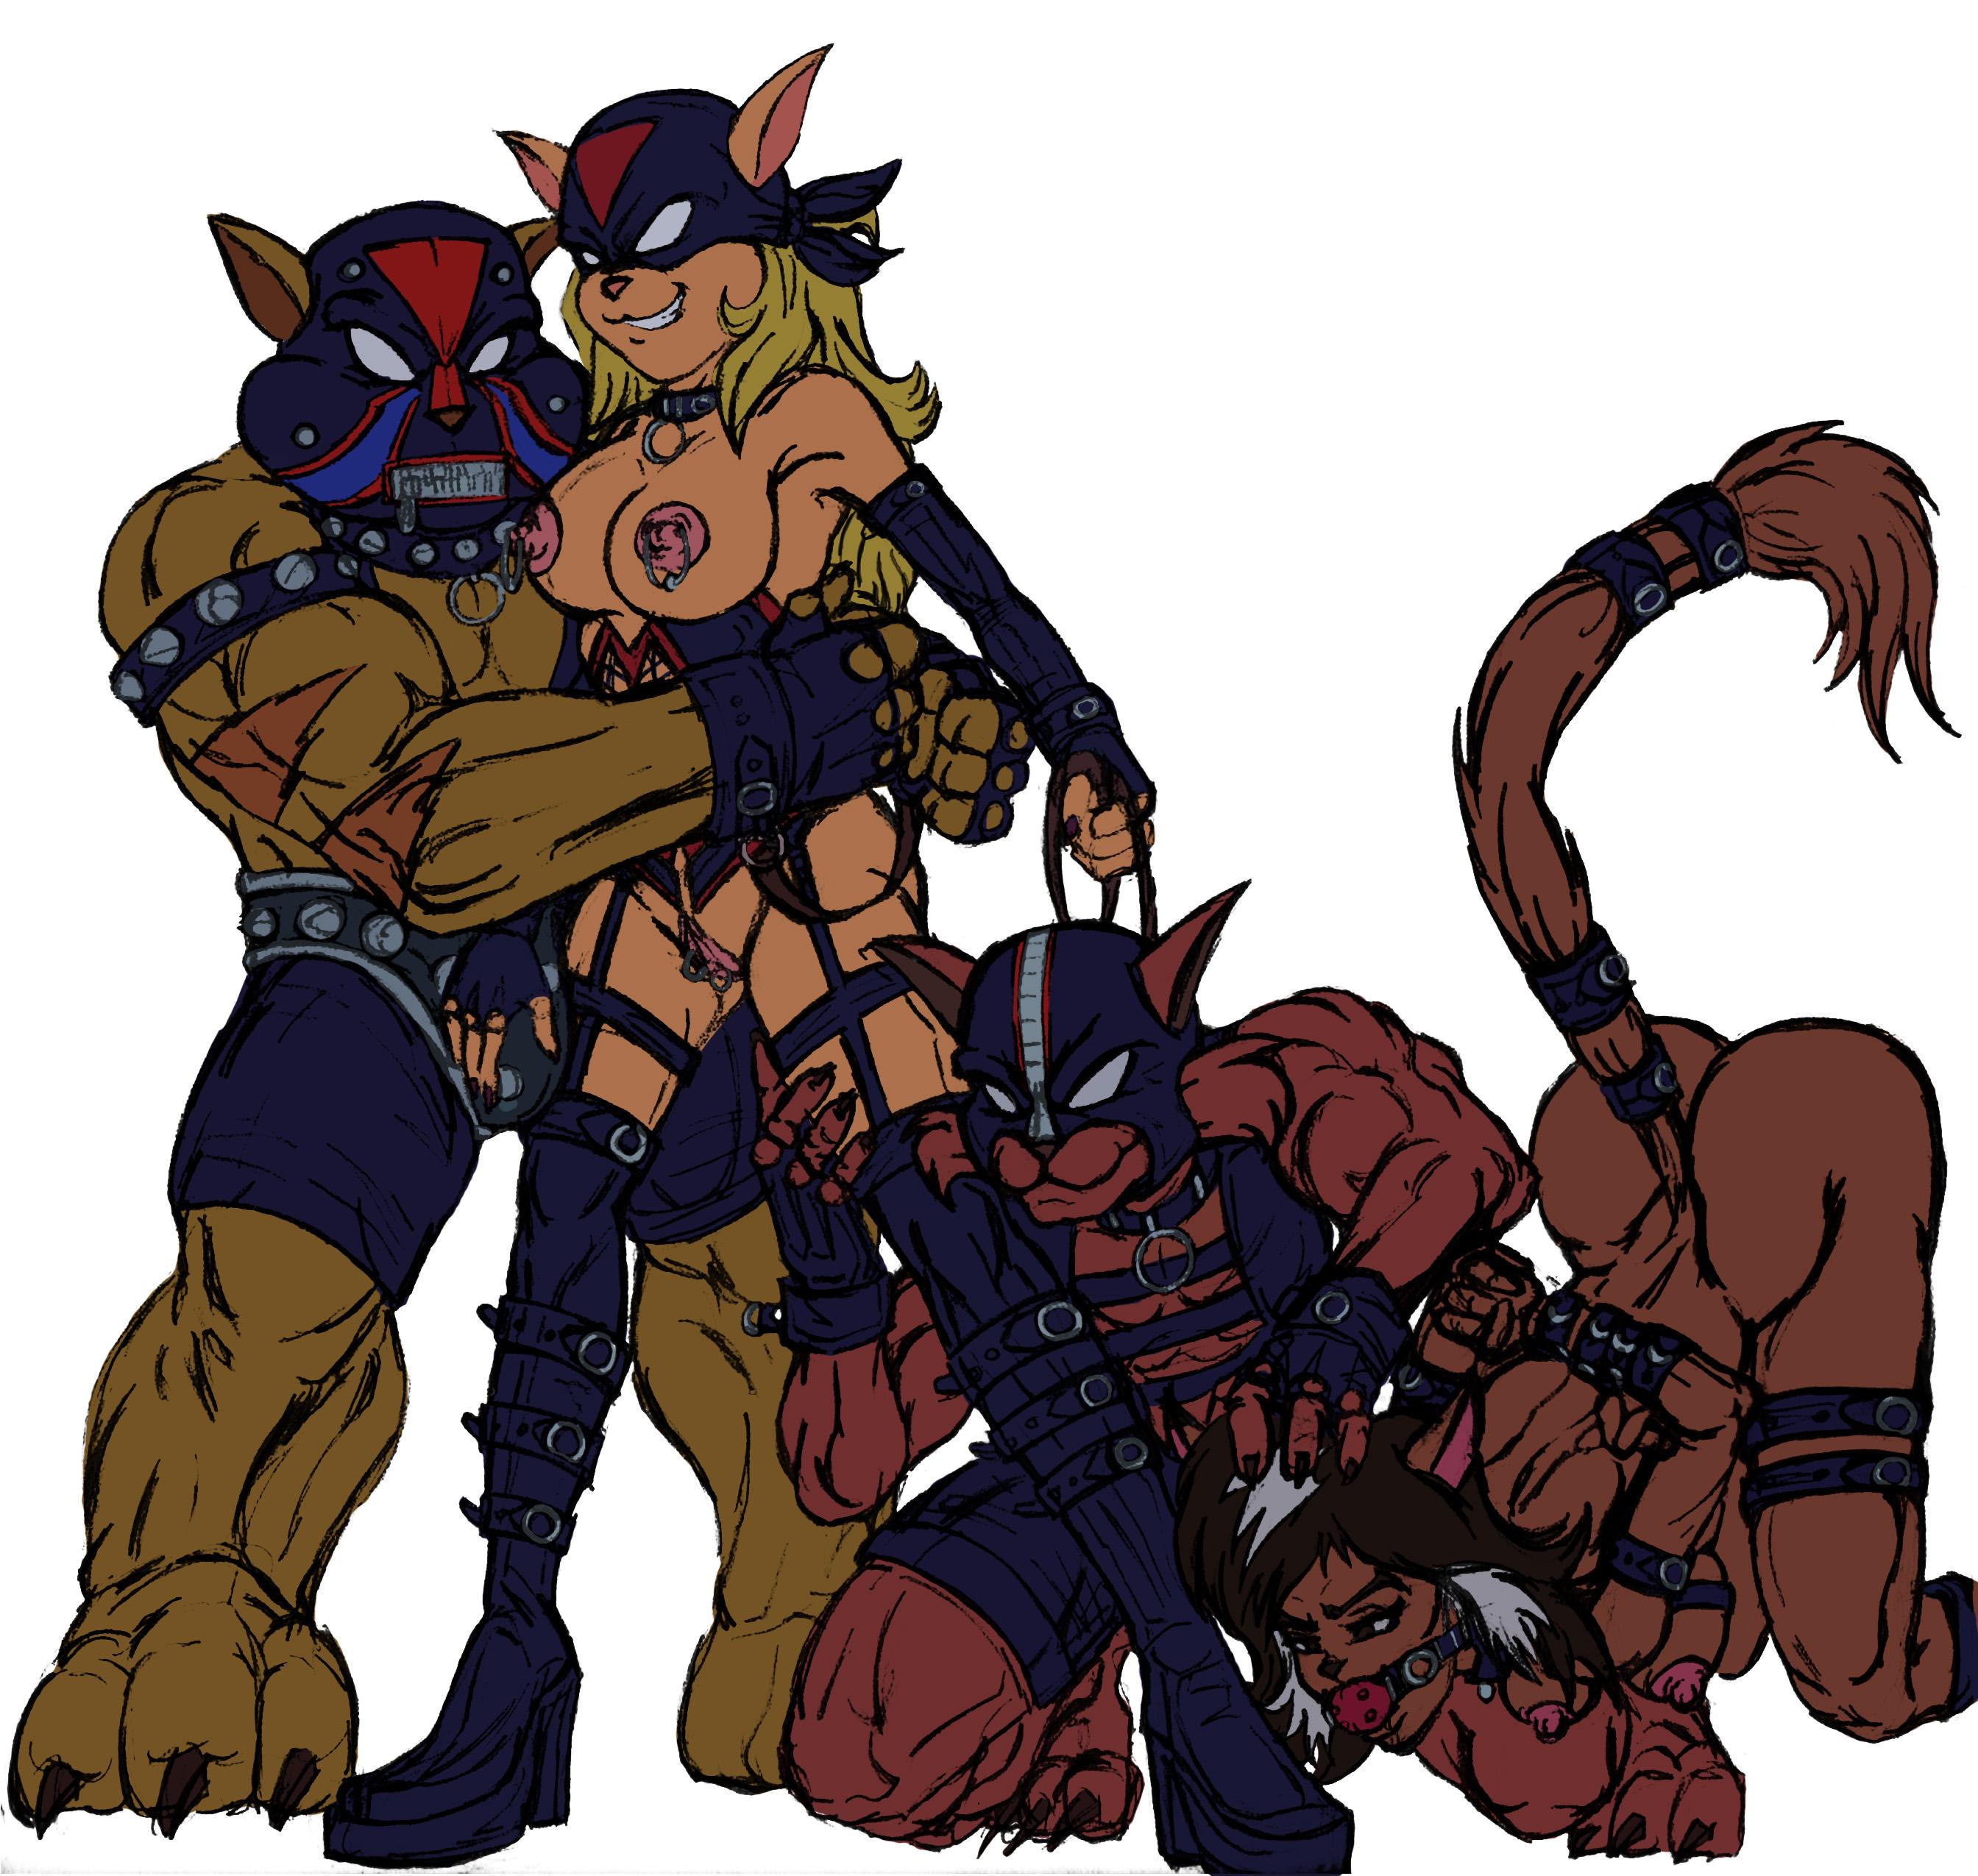 swat callie kats briggs from The venture bros